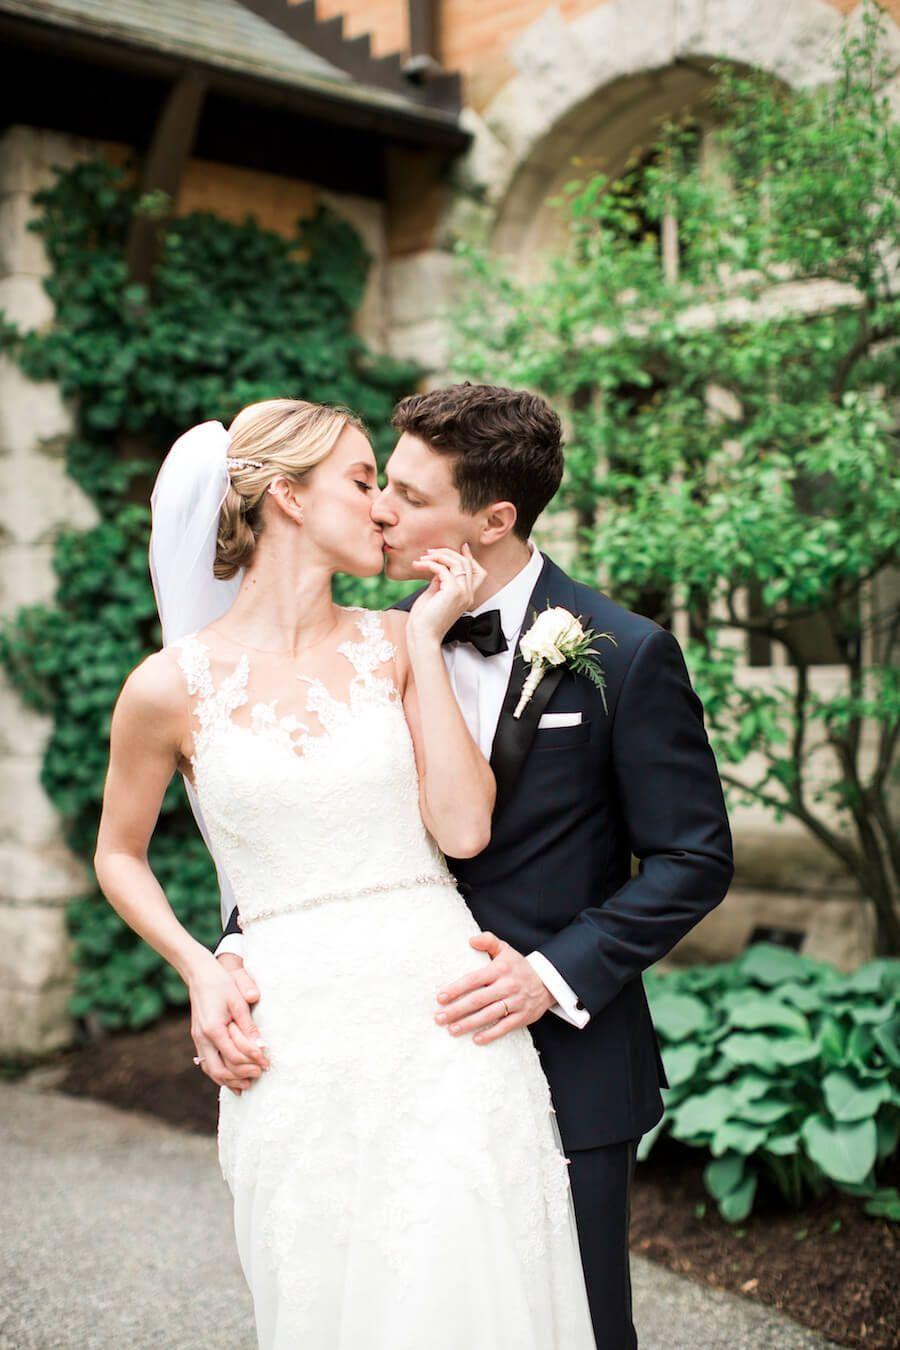 Middle School Sweethearts Tie The Knot On A Black Tie Wedding Classic Elegant Wedding Black Tie Wedding Estate Wedding